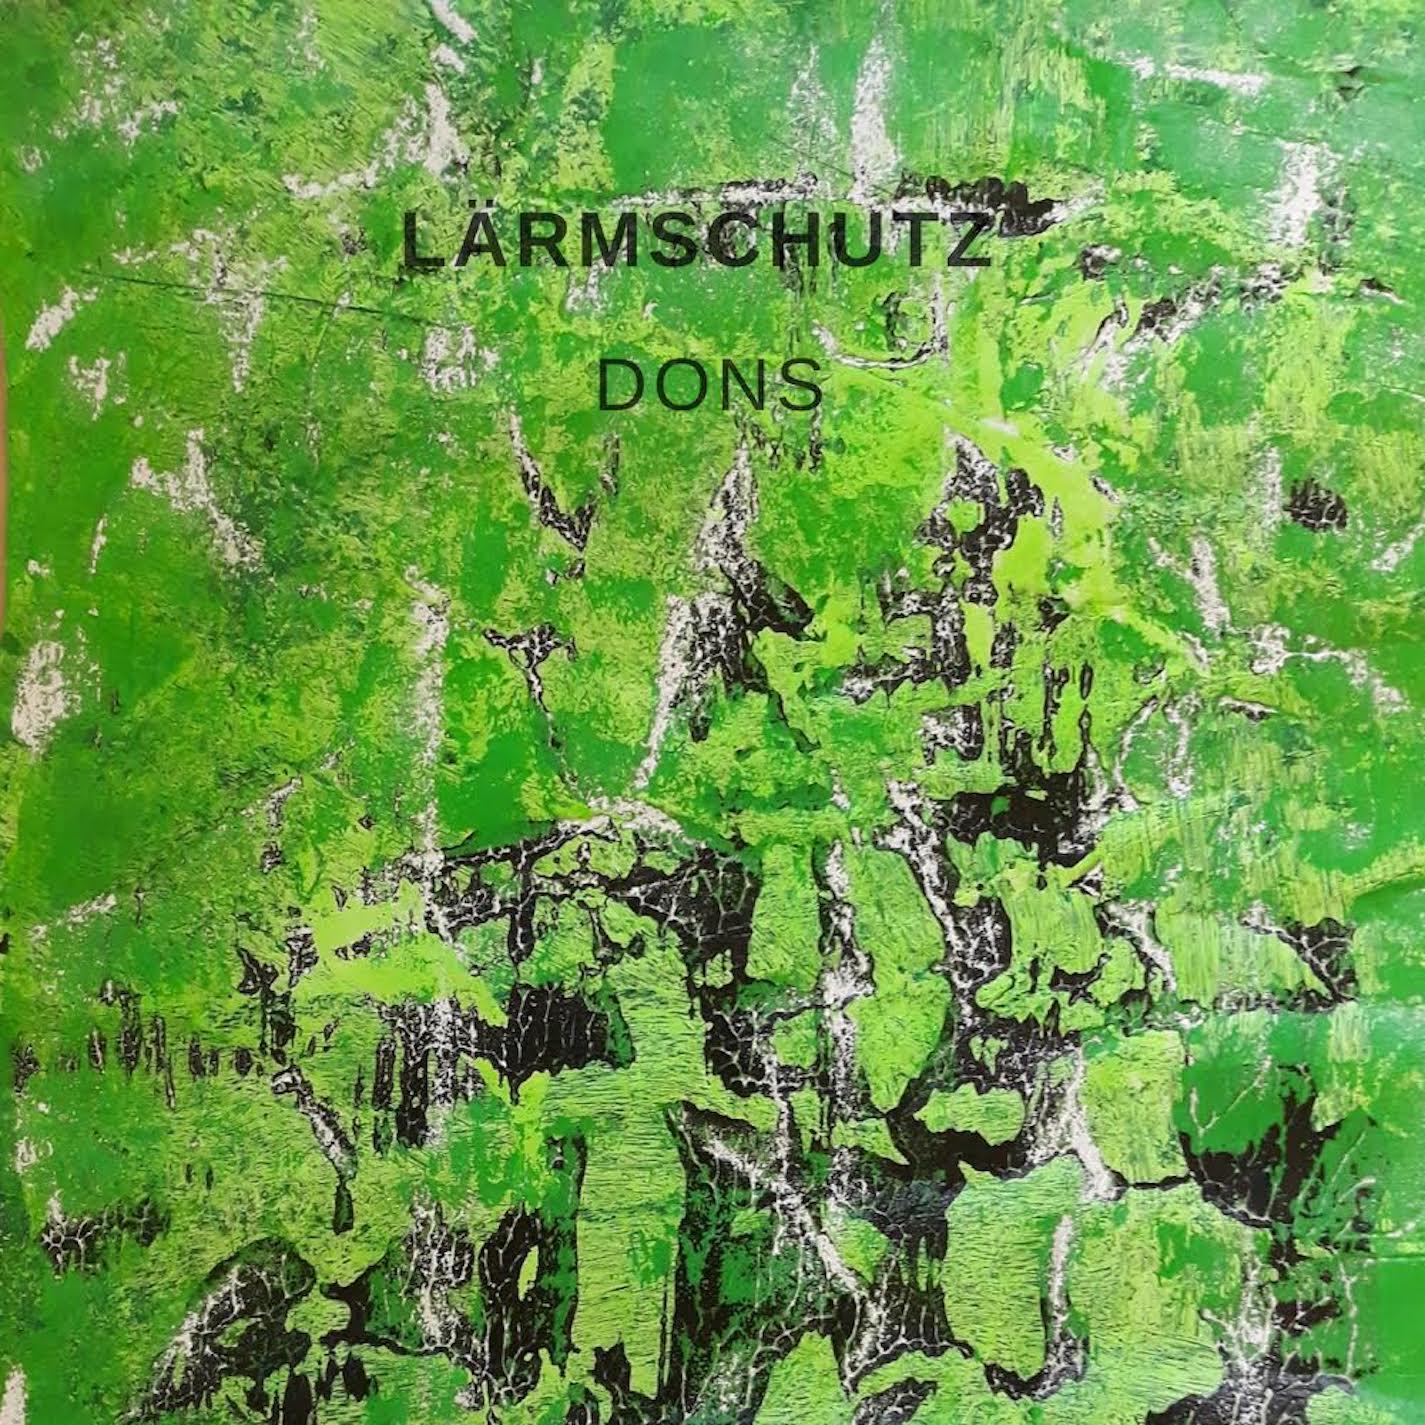 Larmschutz - Dons